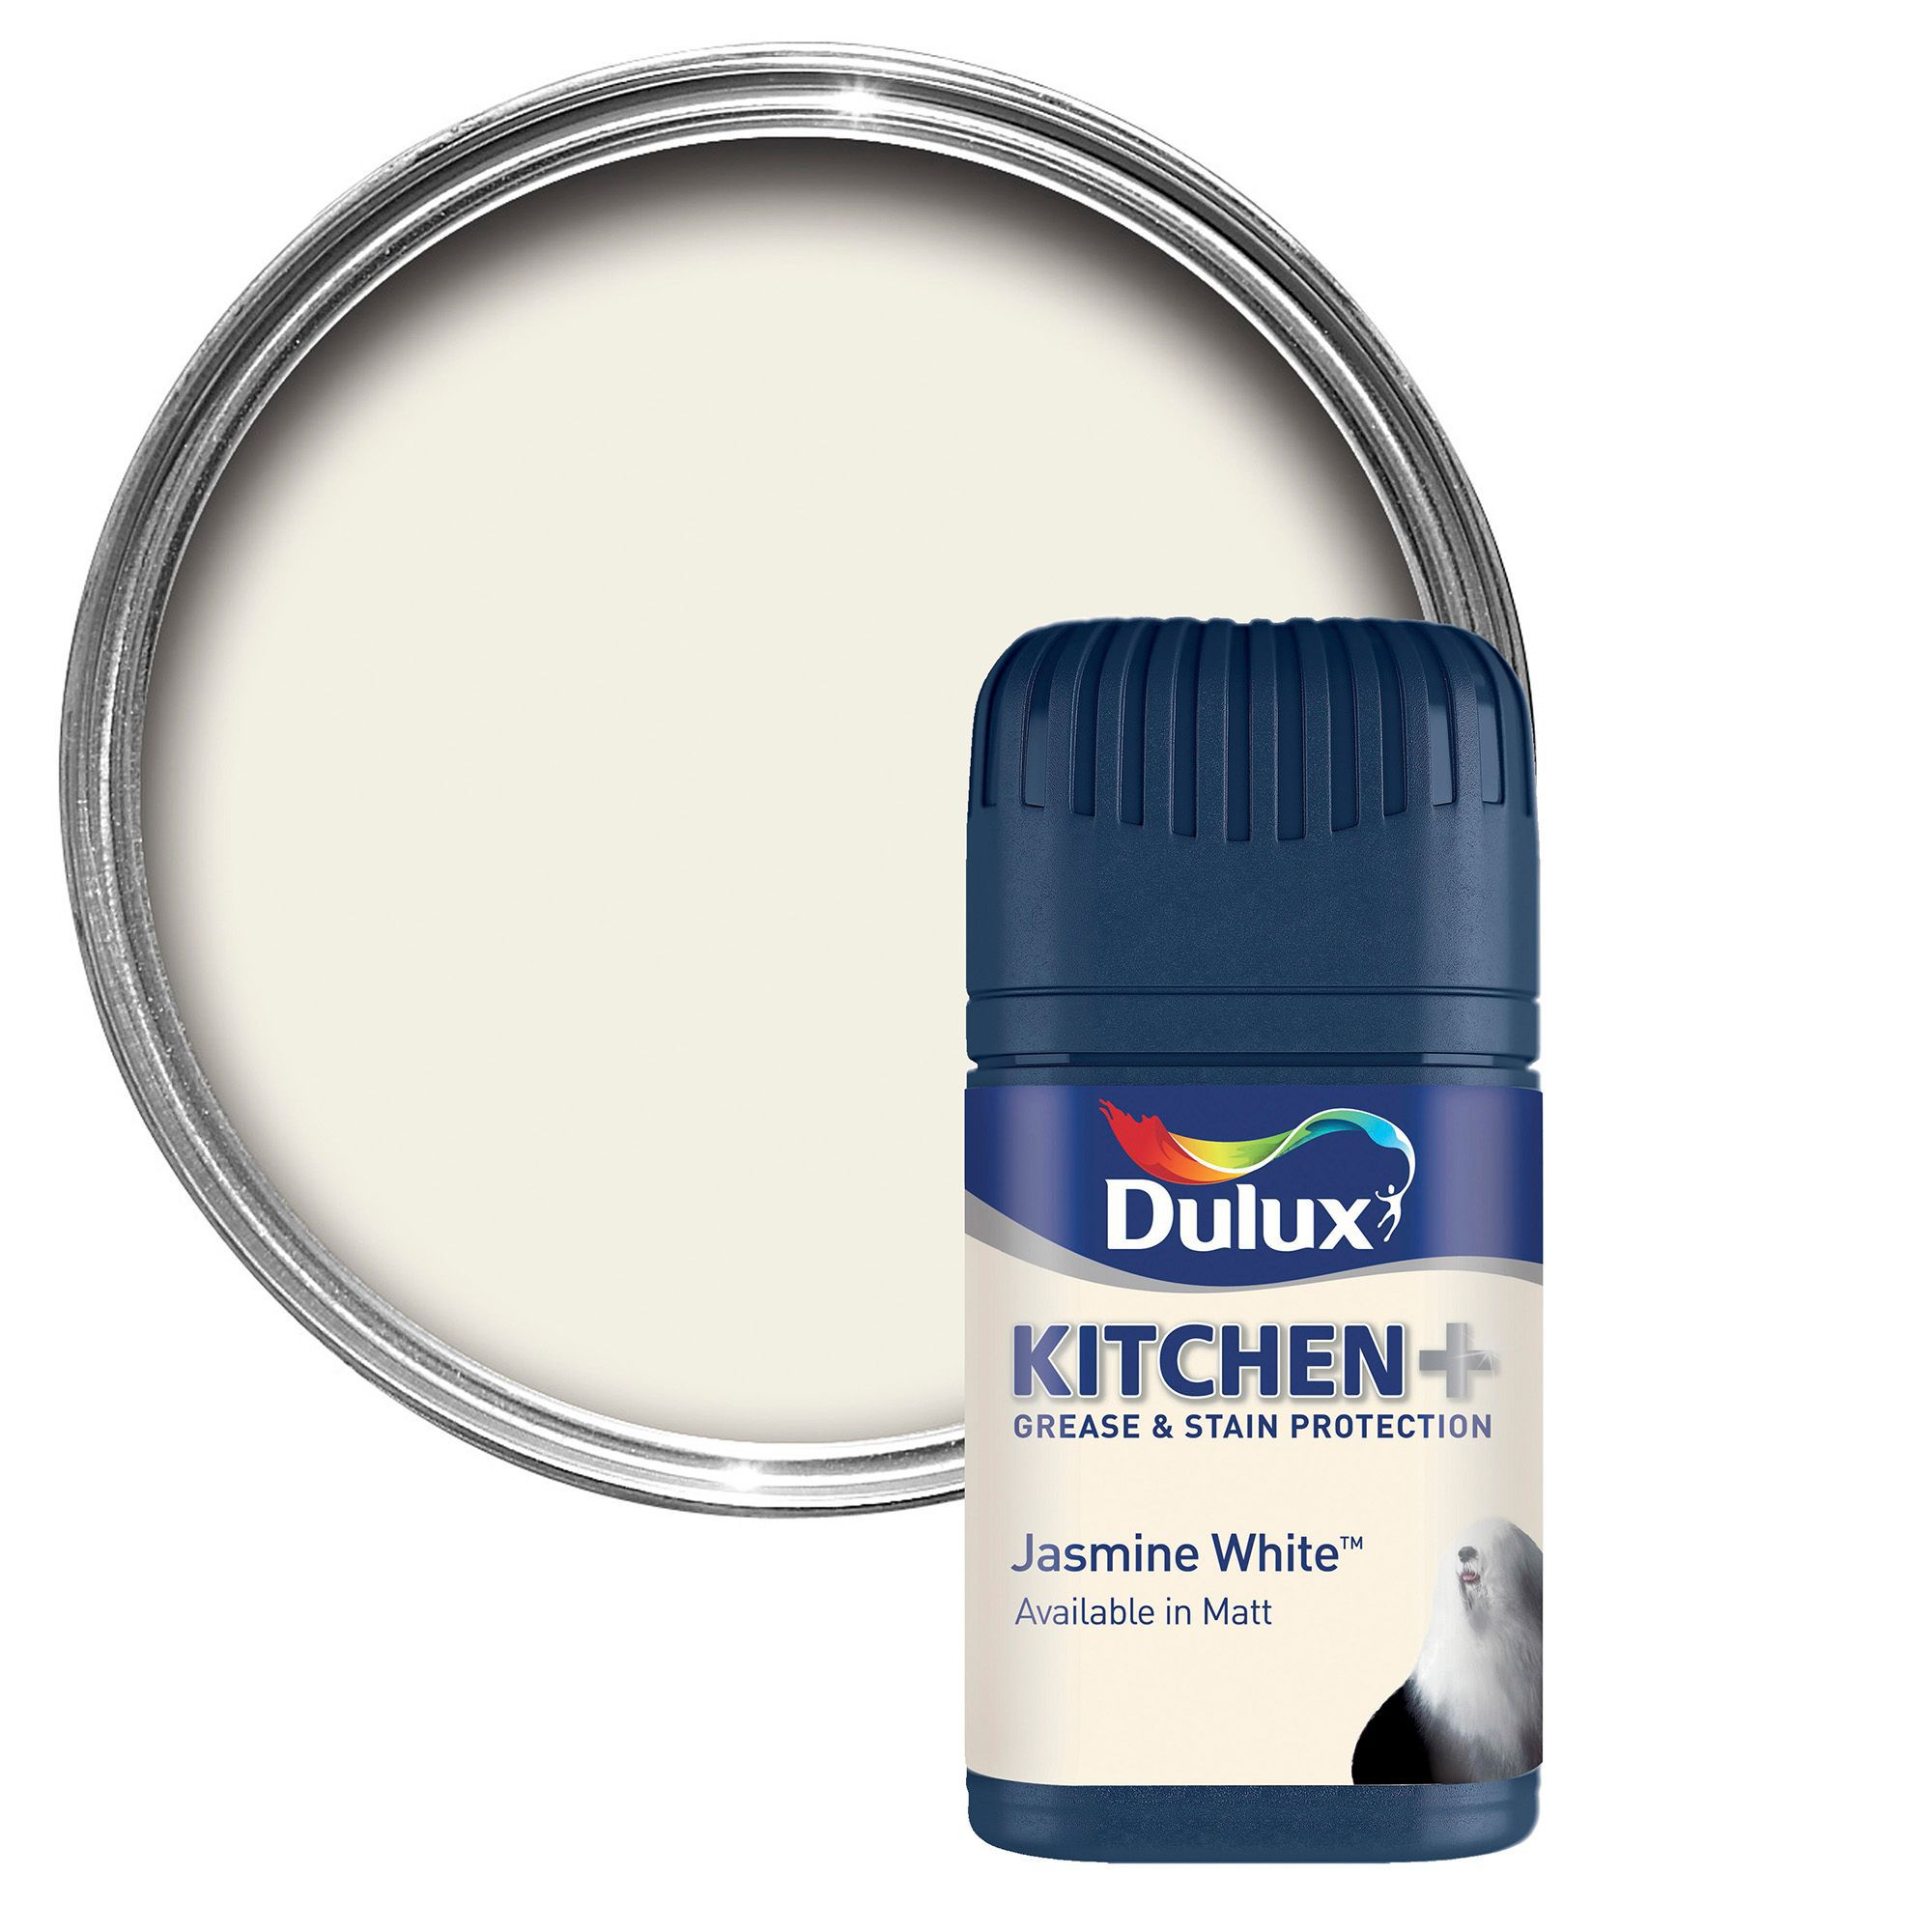 dulux kitchen jasmine white matt emulsion paint. Black Bedroom Furniture Sets. Home Design Ideas